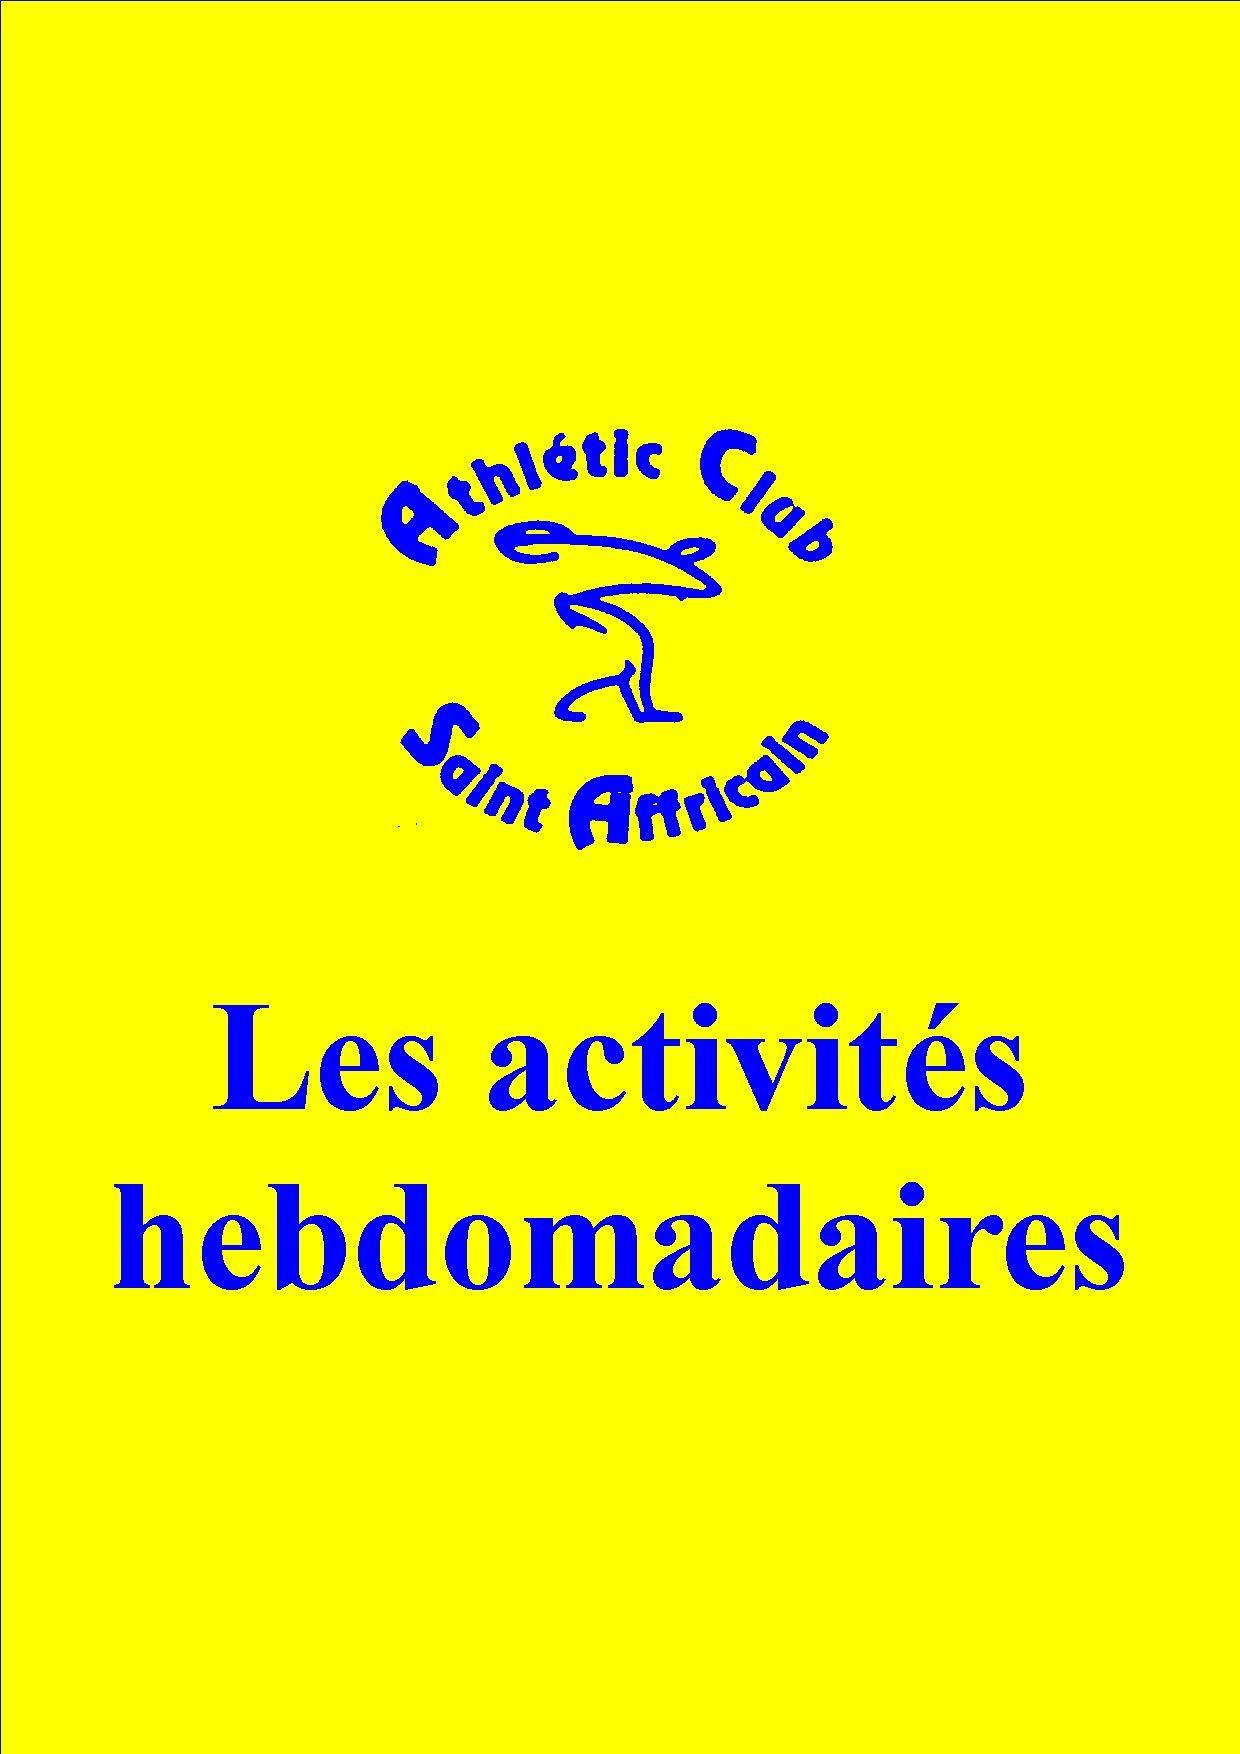 Logo club grand format activités club jaune et bleu